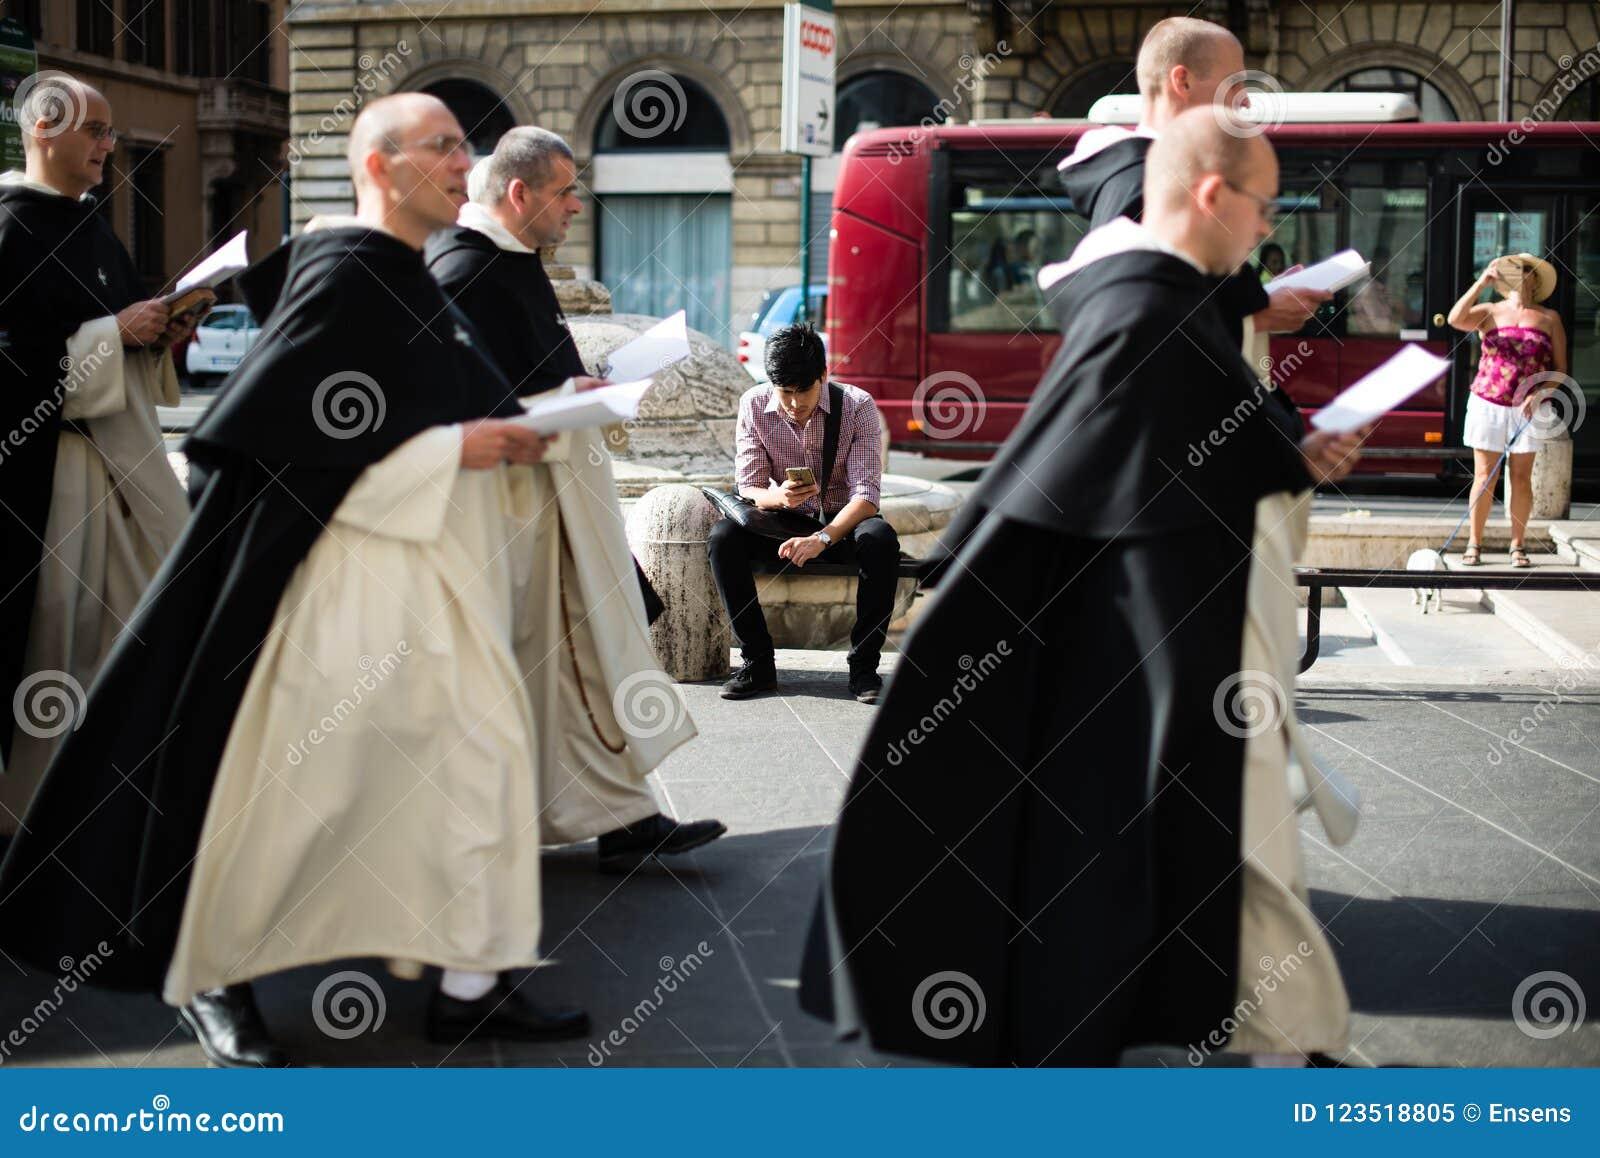 Italy-Rome - 7 September 2017 - celebration of the pilgrimage of